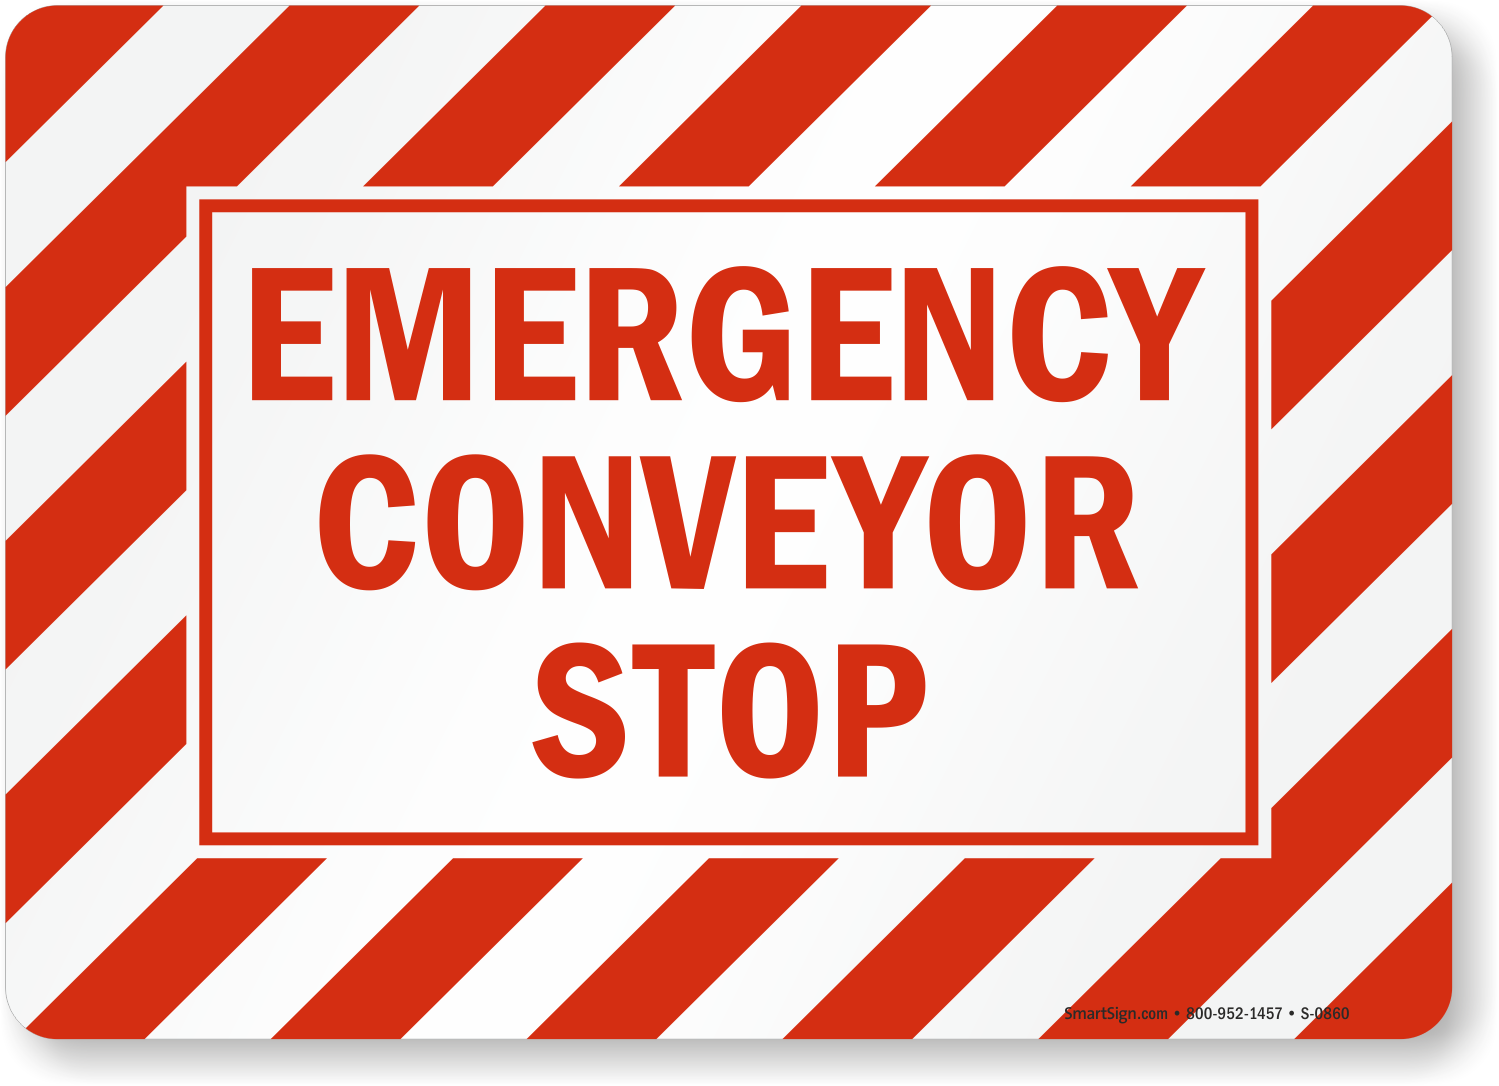 Emergency Conveyor Stop Sign